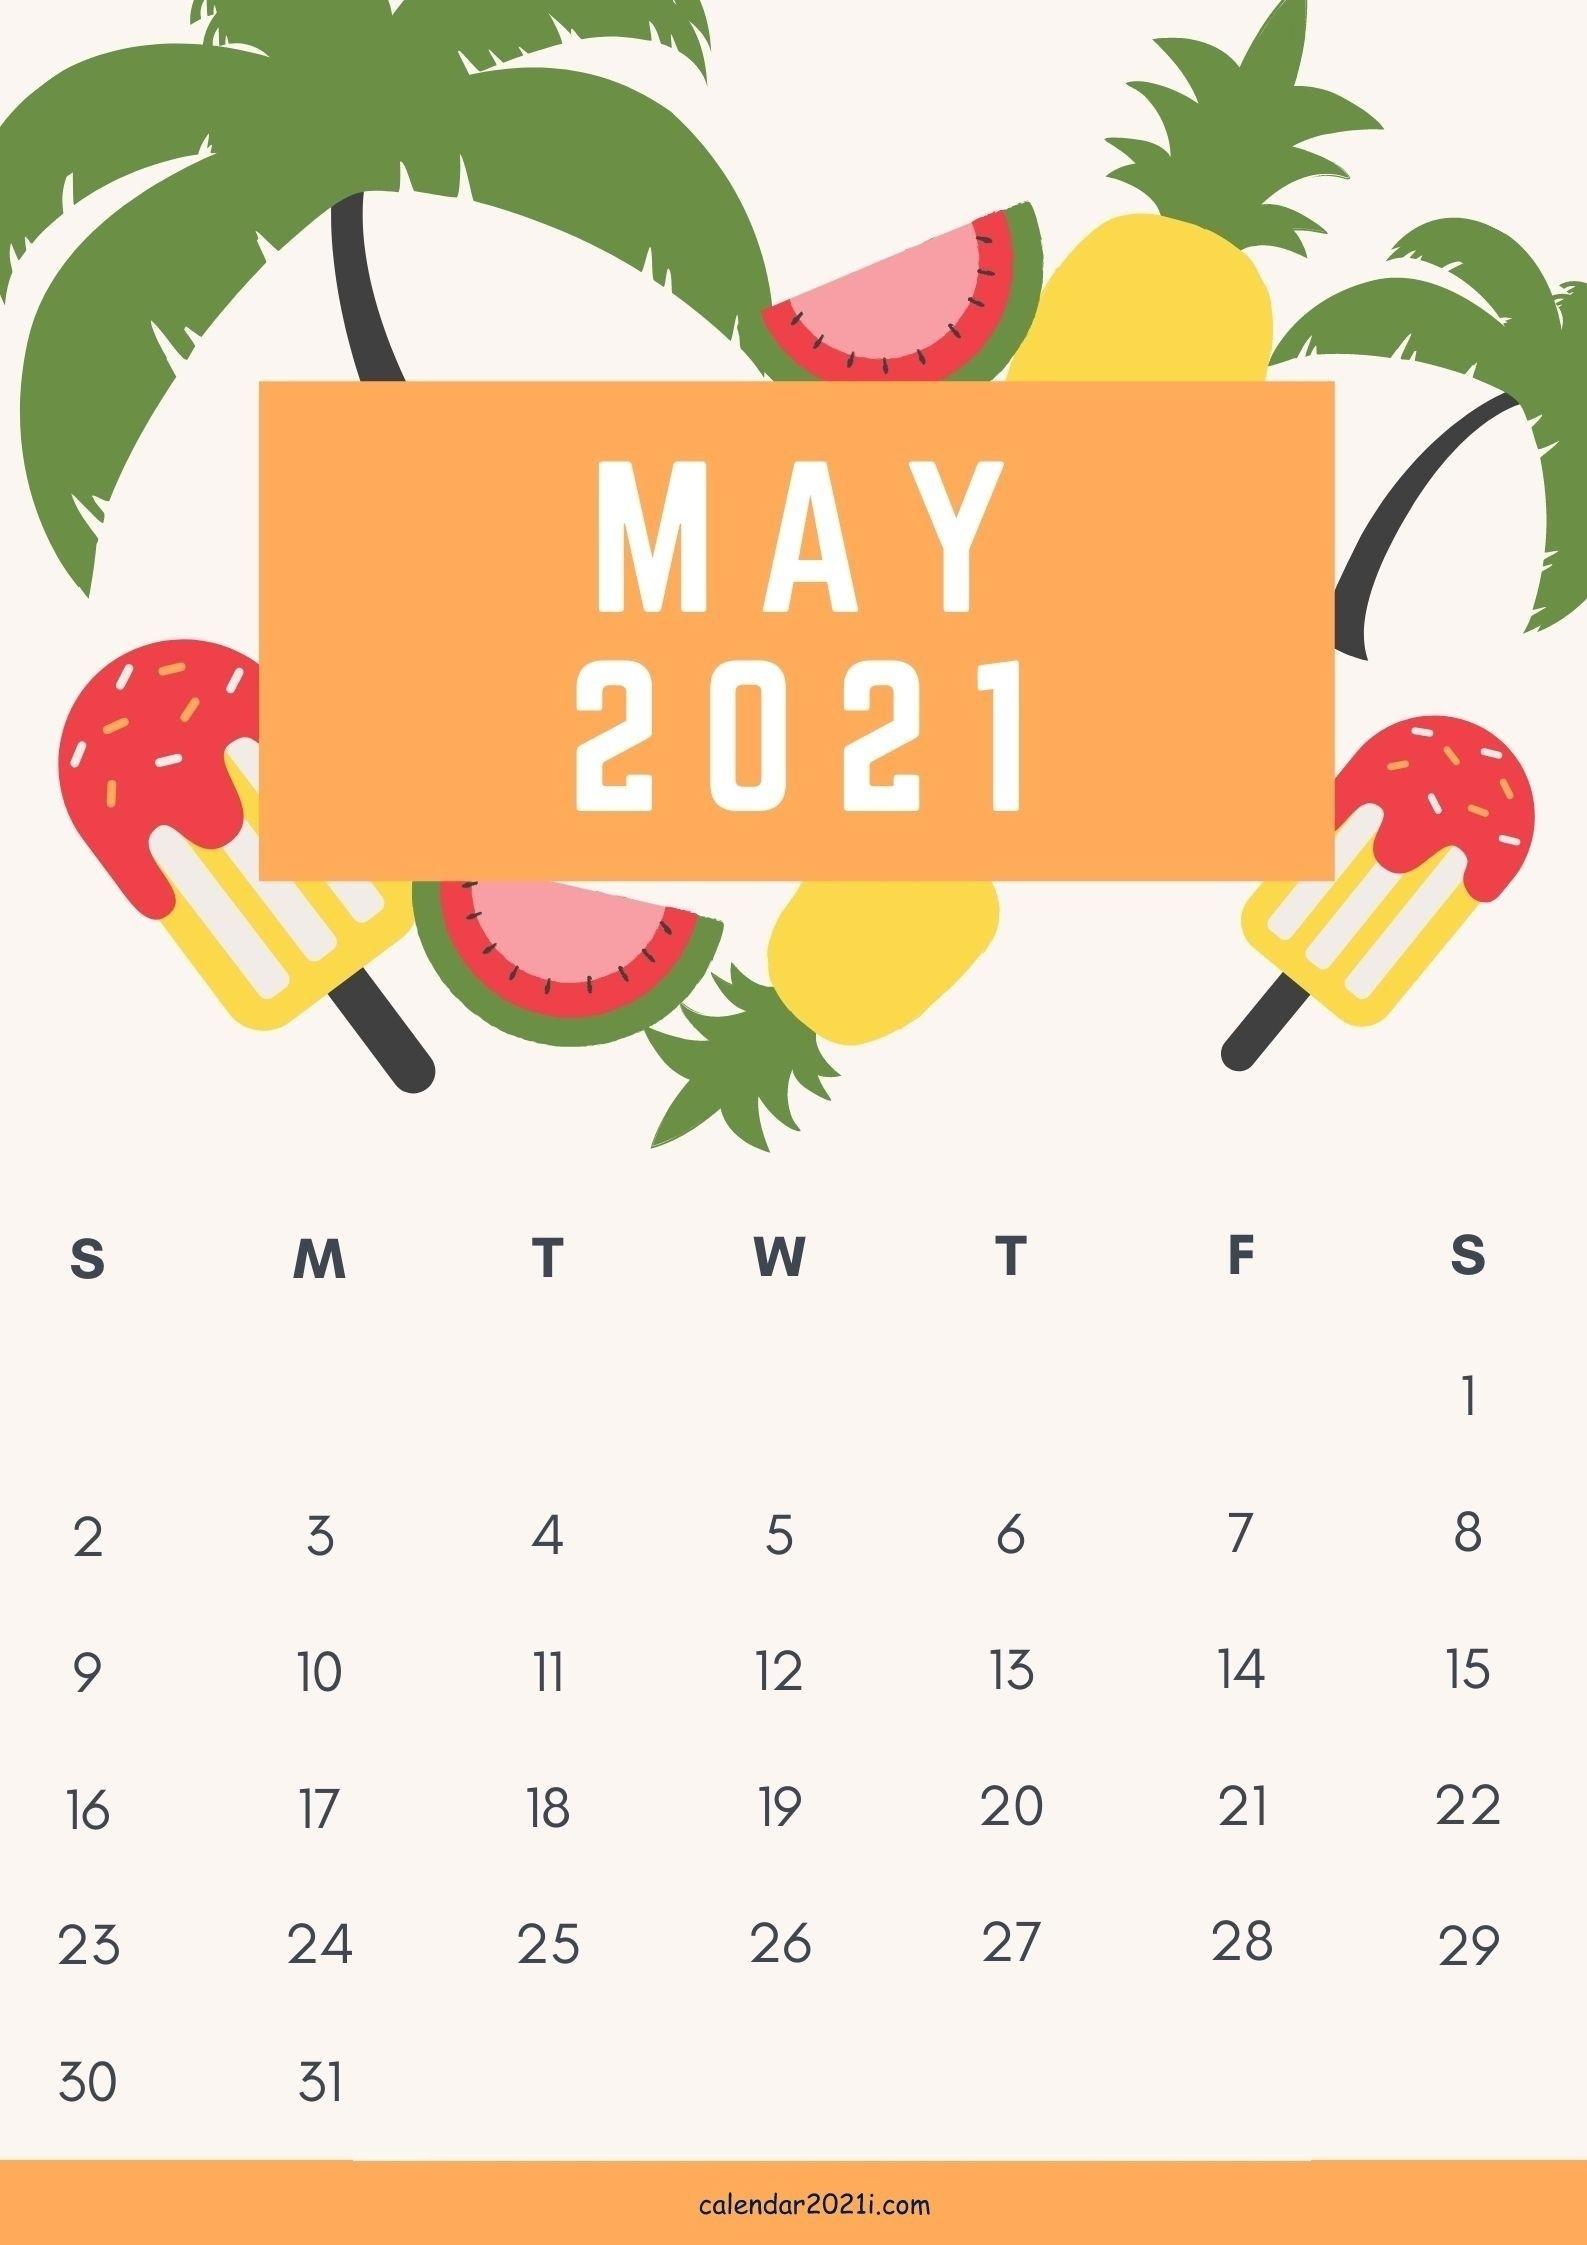 Cute May 2021 Calendar Design Template Free Download Free Calendar Background Templates